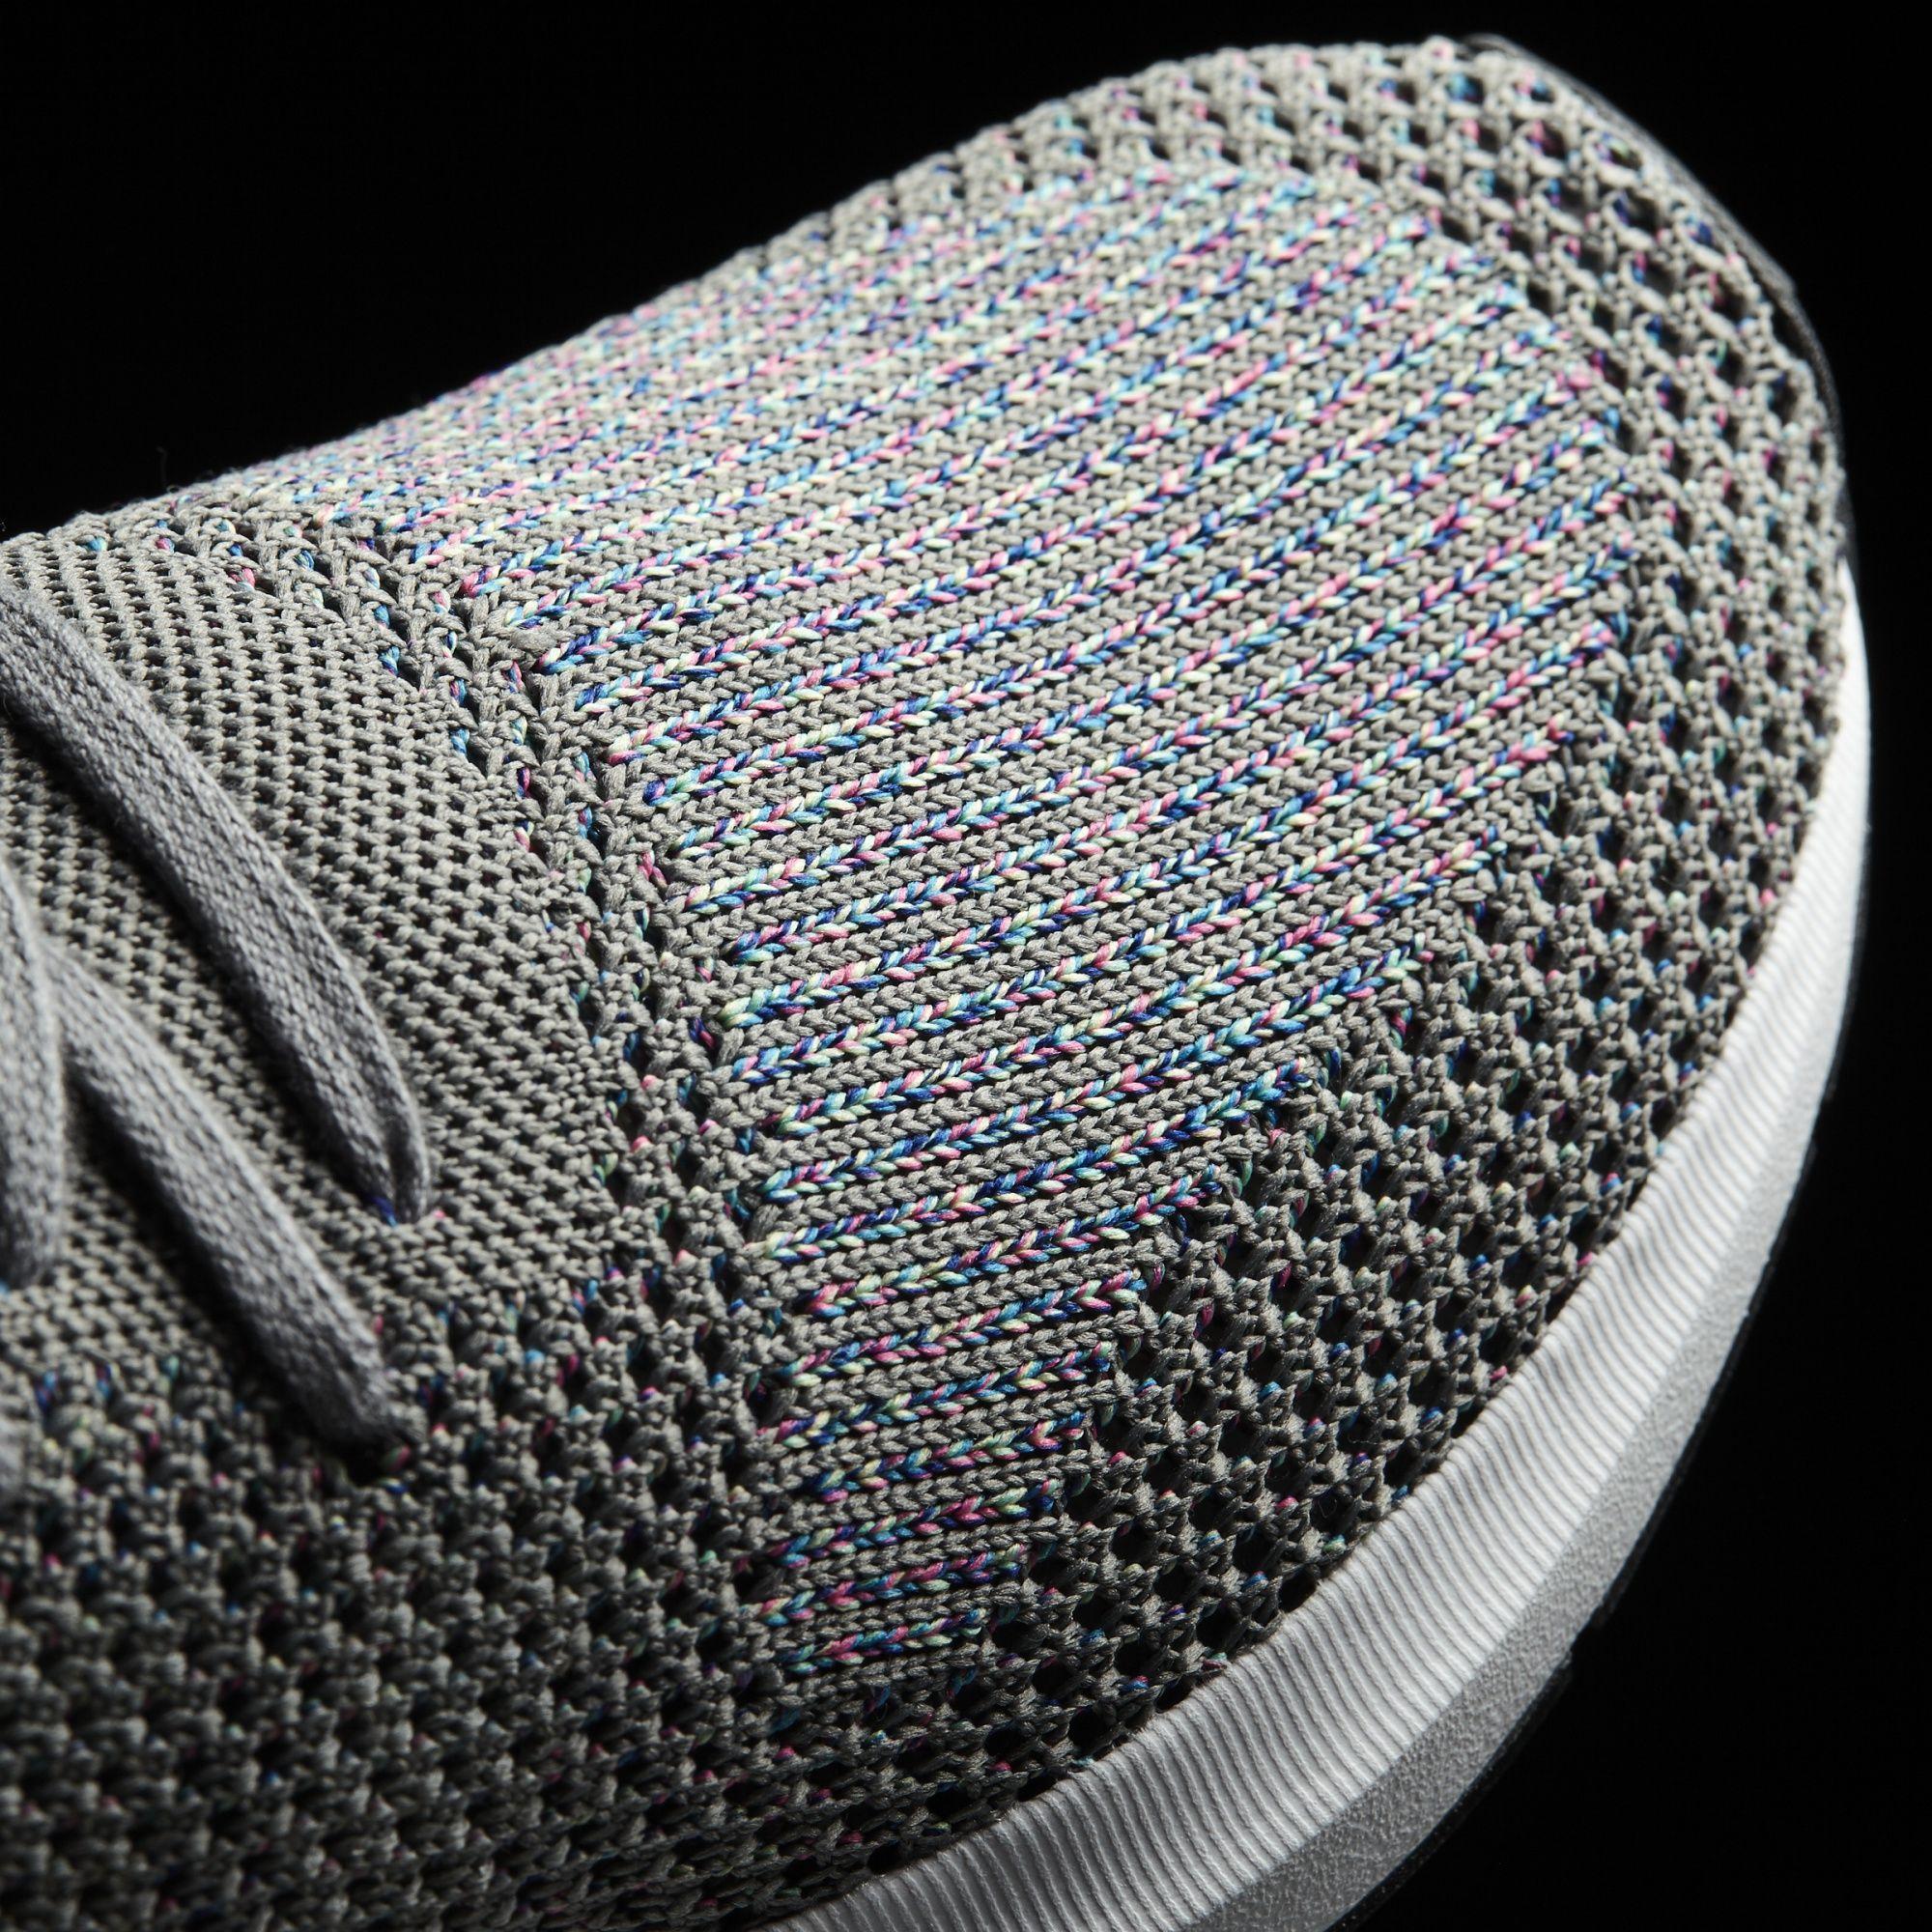 CG4128 adidas Swift Run Primeknit Grey 4